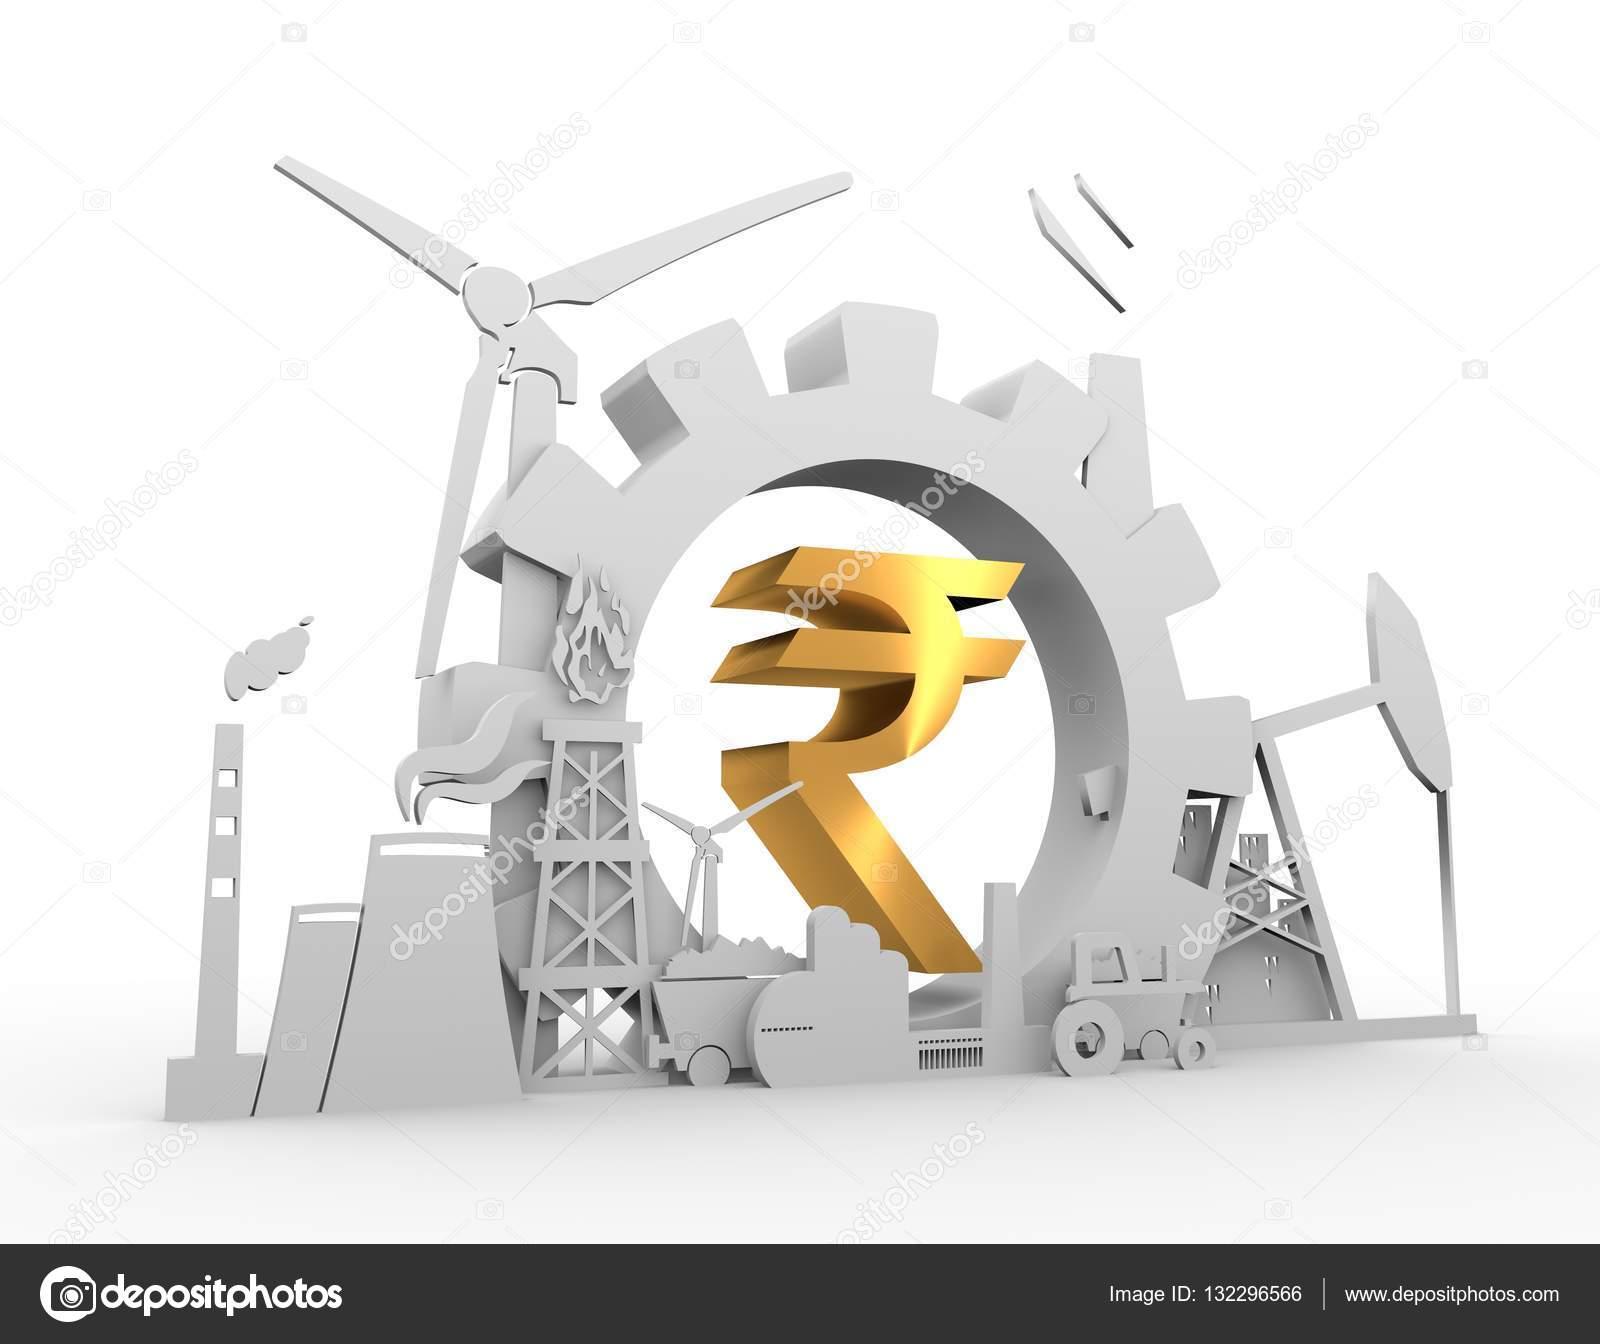 Golden indian rupee symbol stock photo jegasra 132296566 golden indian rupee symbol stock photo biocorpaavc